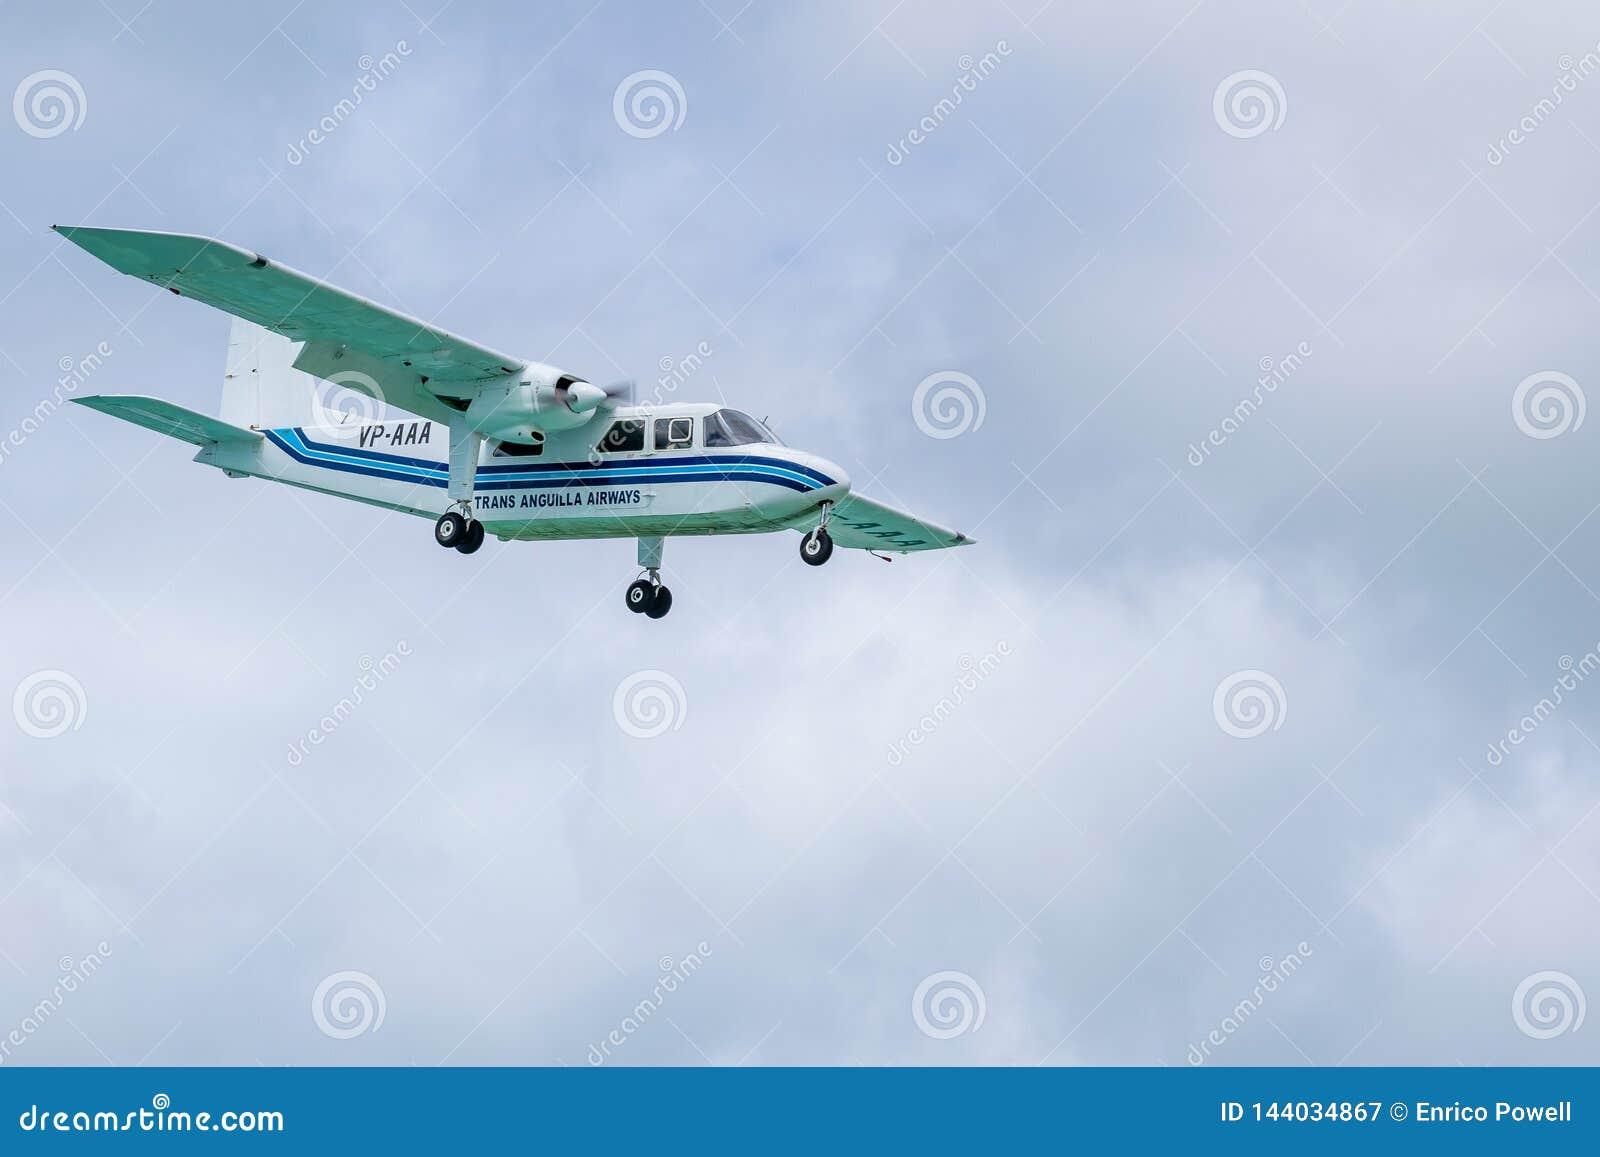 Trans Anguilla Airways VP-AAA, A Britten-Norman BN-2A-21 Islander